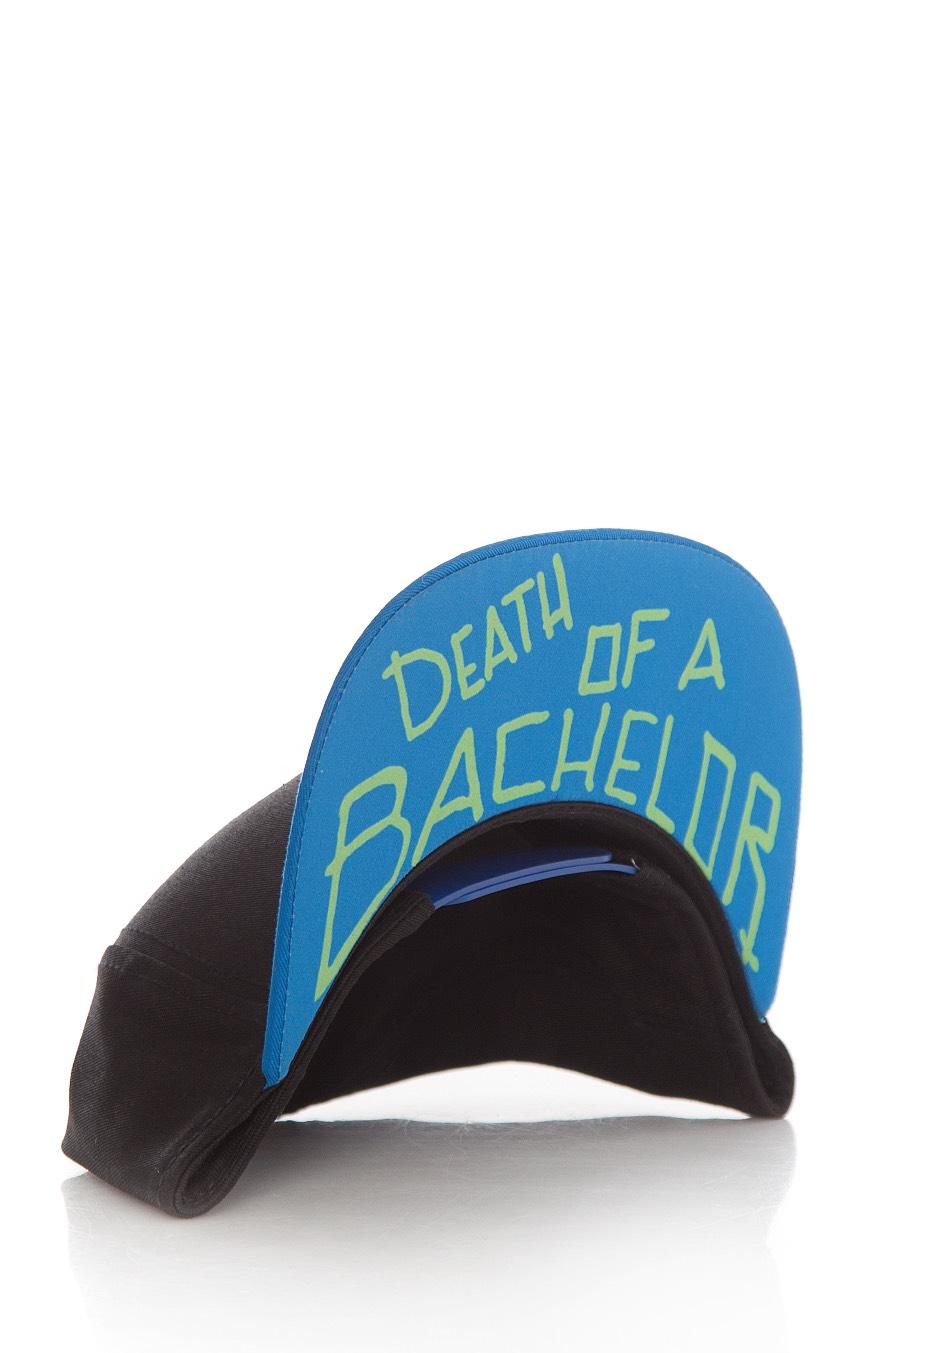 Panic! At The Disco - Death Of A Bachelor Black Blue - Cap ... 2a2c5bbd8d2